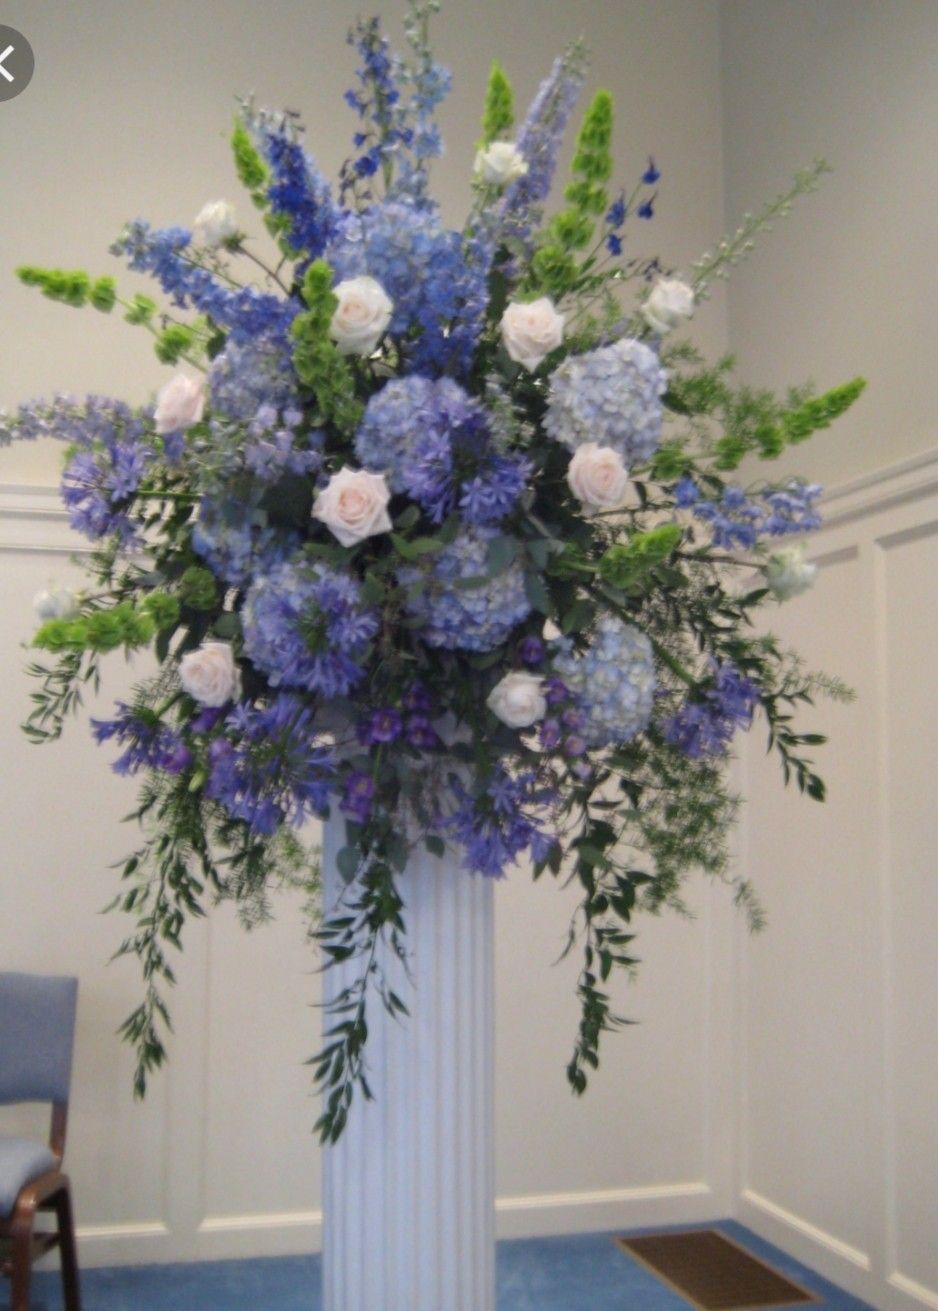 Pin By Frans On Flower Arrangements In 2020 Blue Flower Arrangements Large Flower Arrangements Large Floral Arrangements